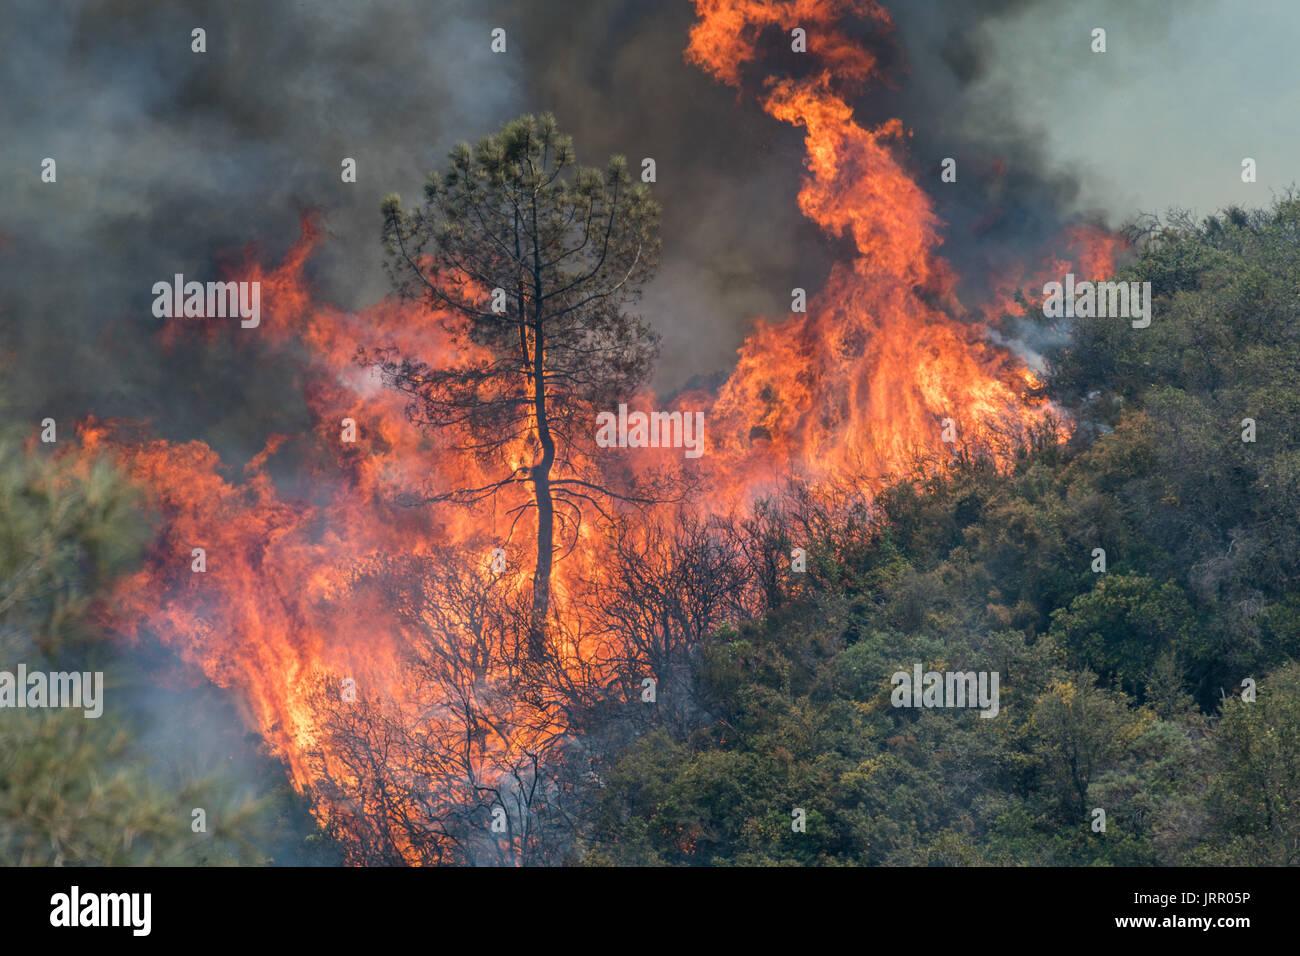 Detwiler Fire, California near Mariposa - Stock Image